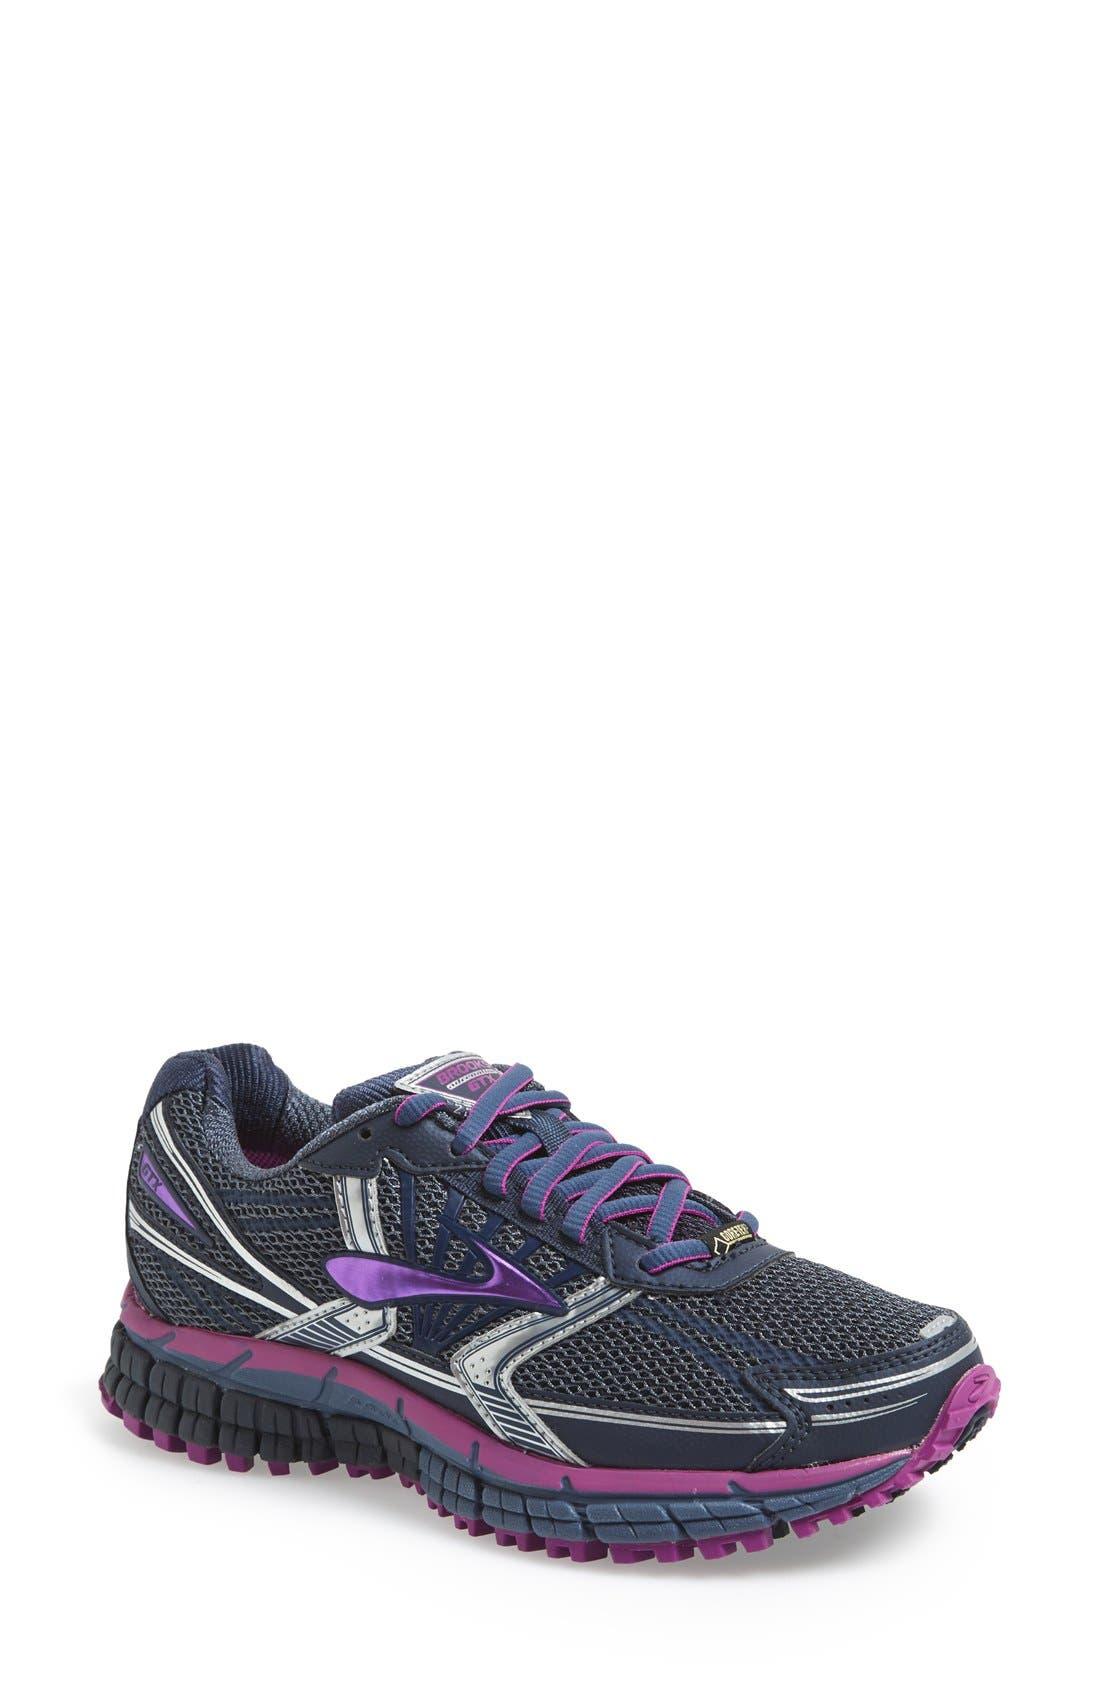 Alternate Image 1 Selected - Brooks 'Adrenaline ASR 11 GTX' Waterproof Running Shoe (Women)